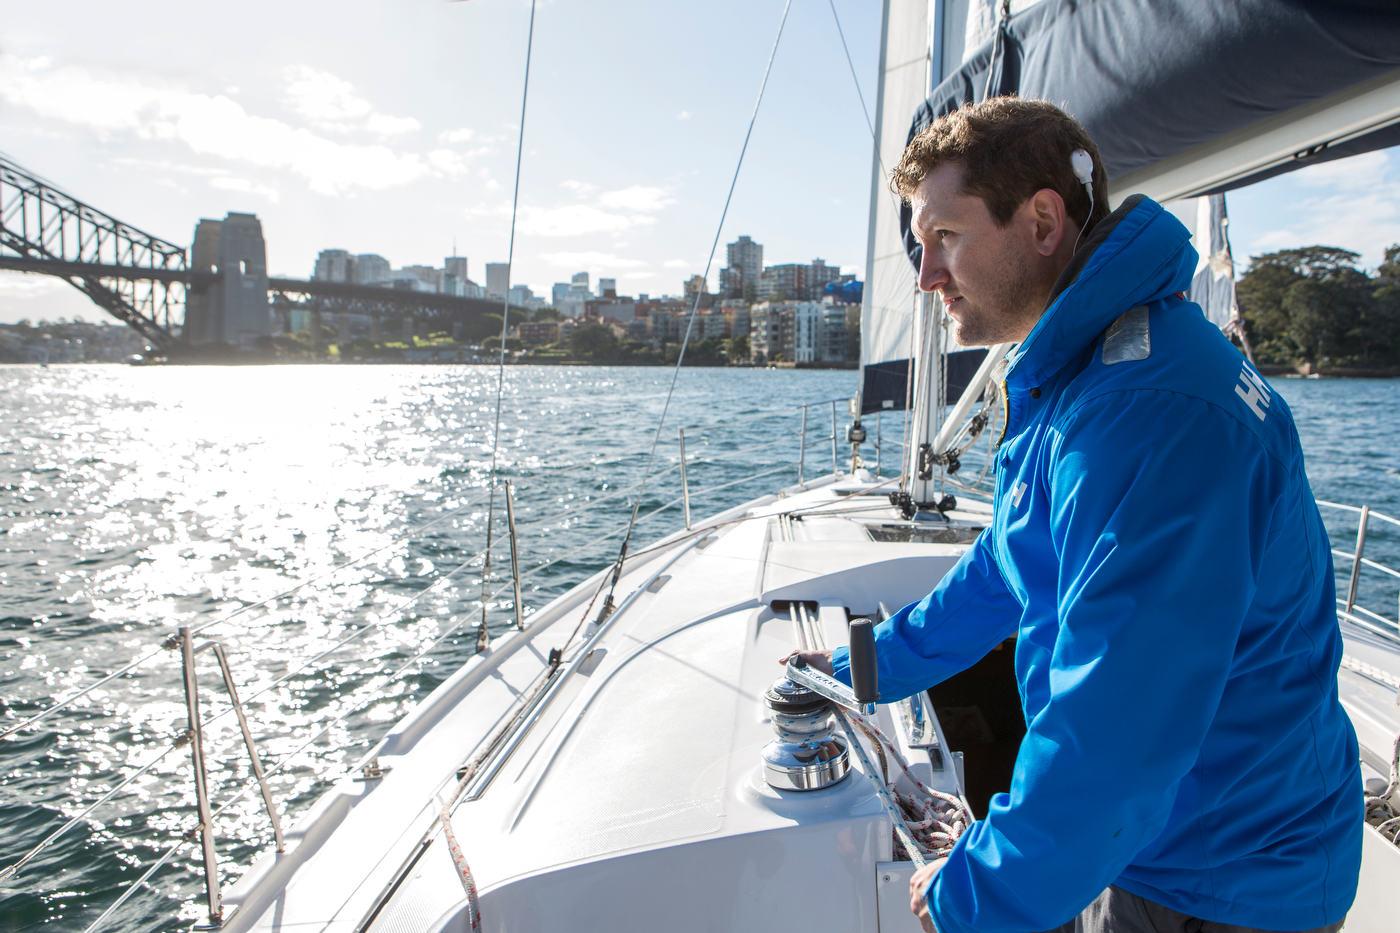 Llyod, competitive sailor, Sydney, Australia.